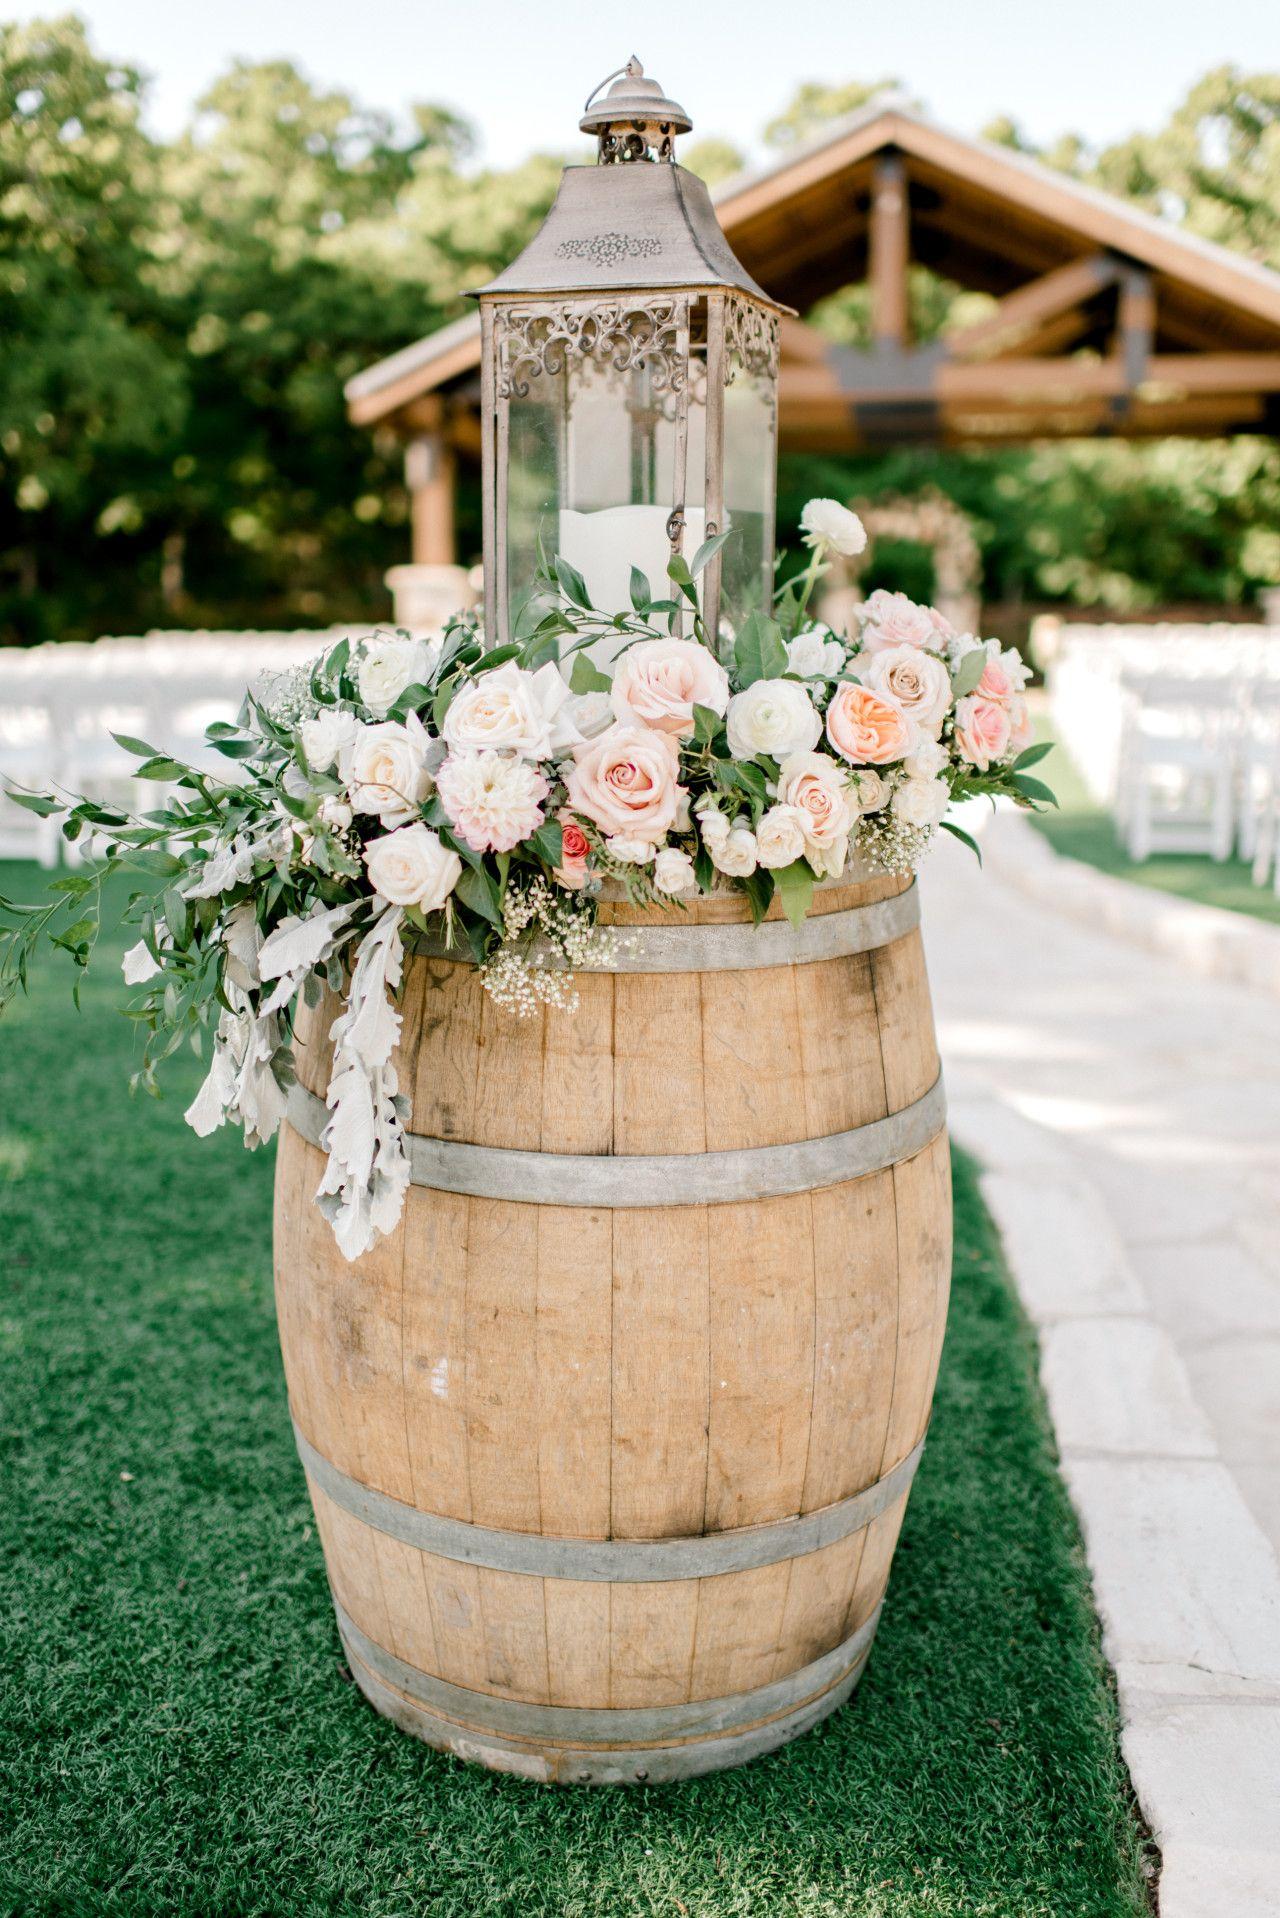 Wedding decorations natural  outdoor wedding ceremony decor ideas  natural  elegant outdoor